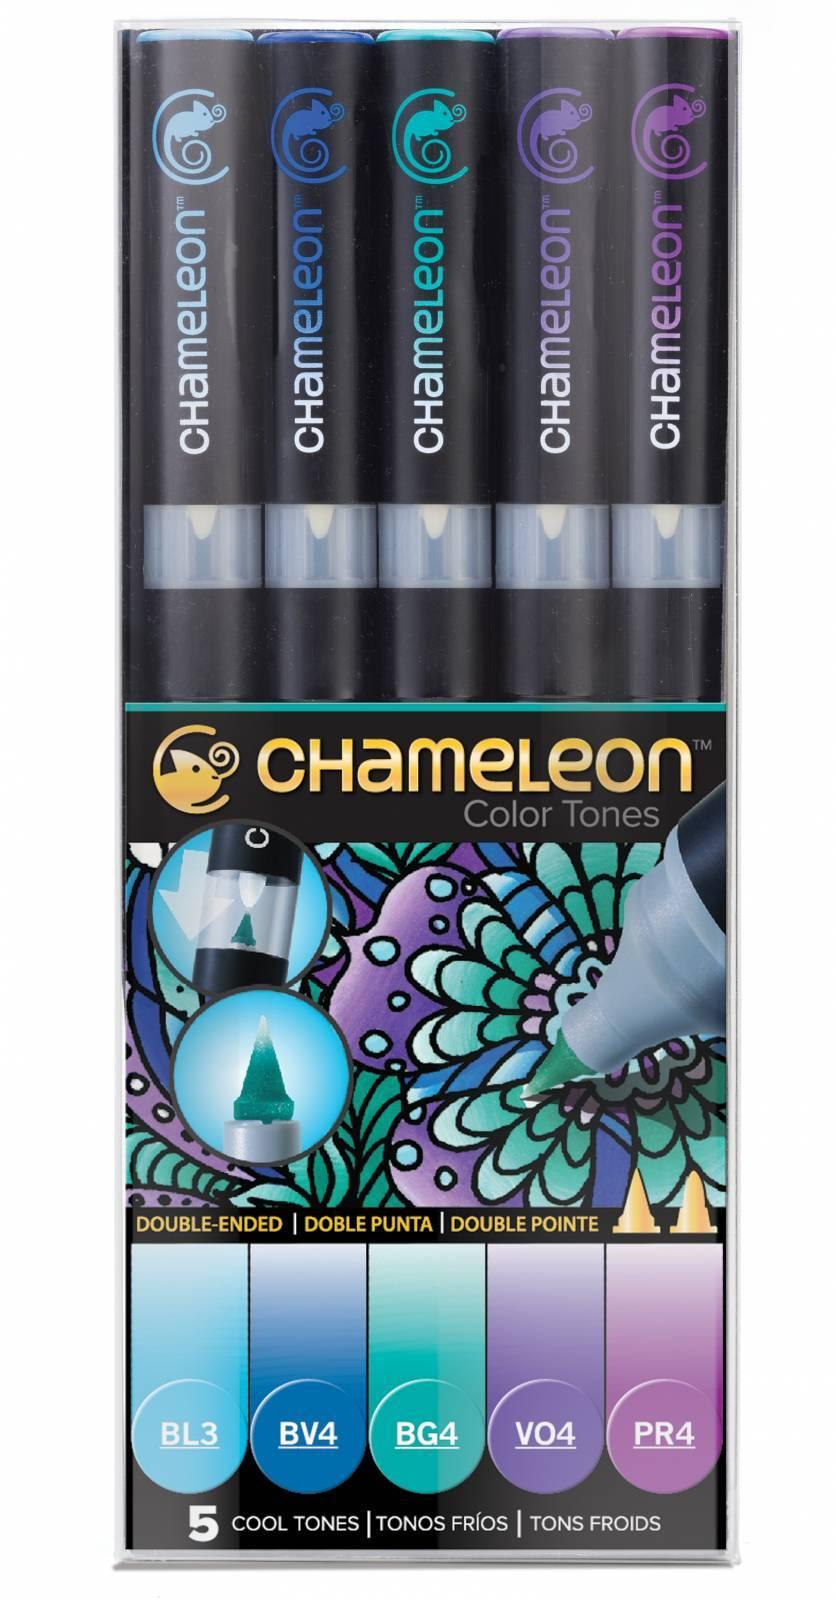 Kit Chameleon 5 canetas - Tons de Frios - Papelaria Botafogo